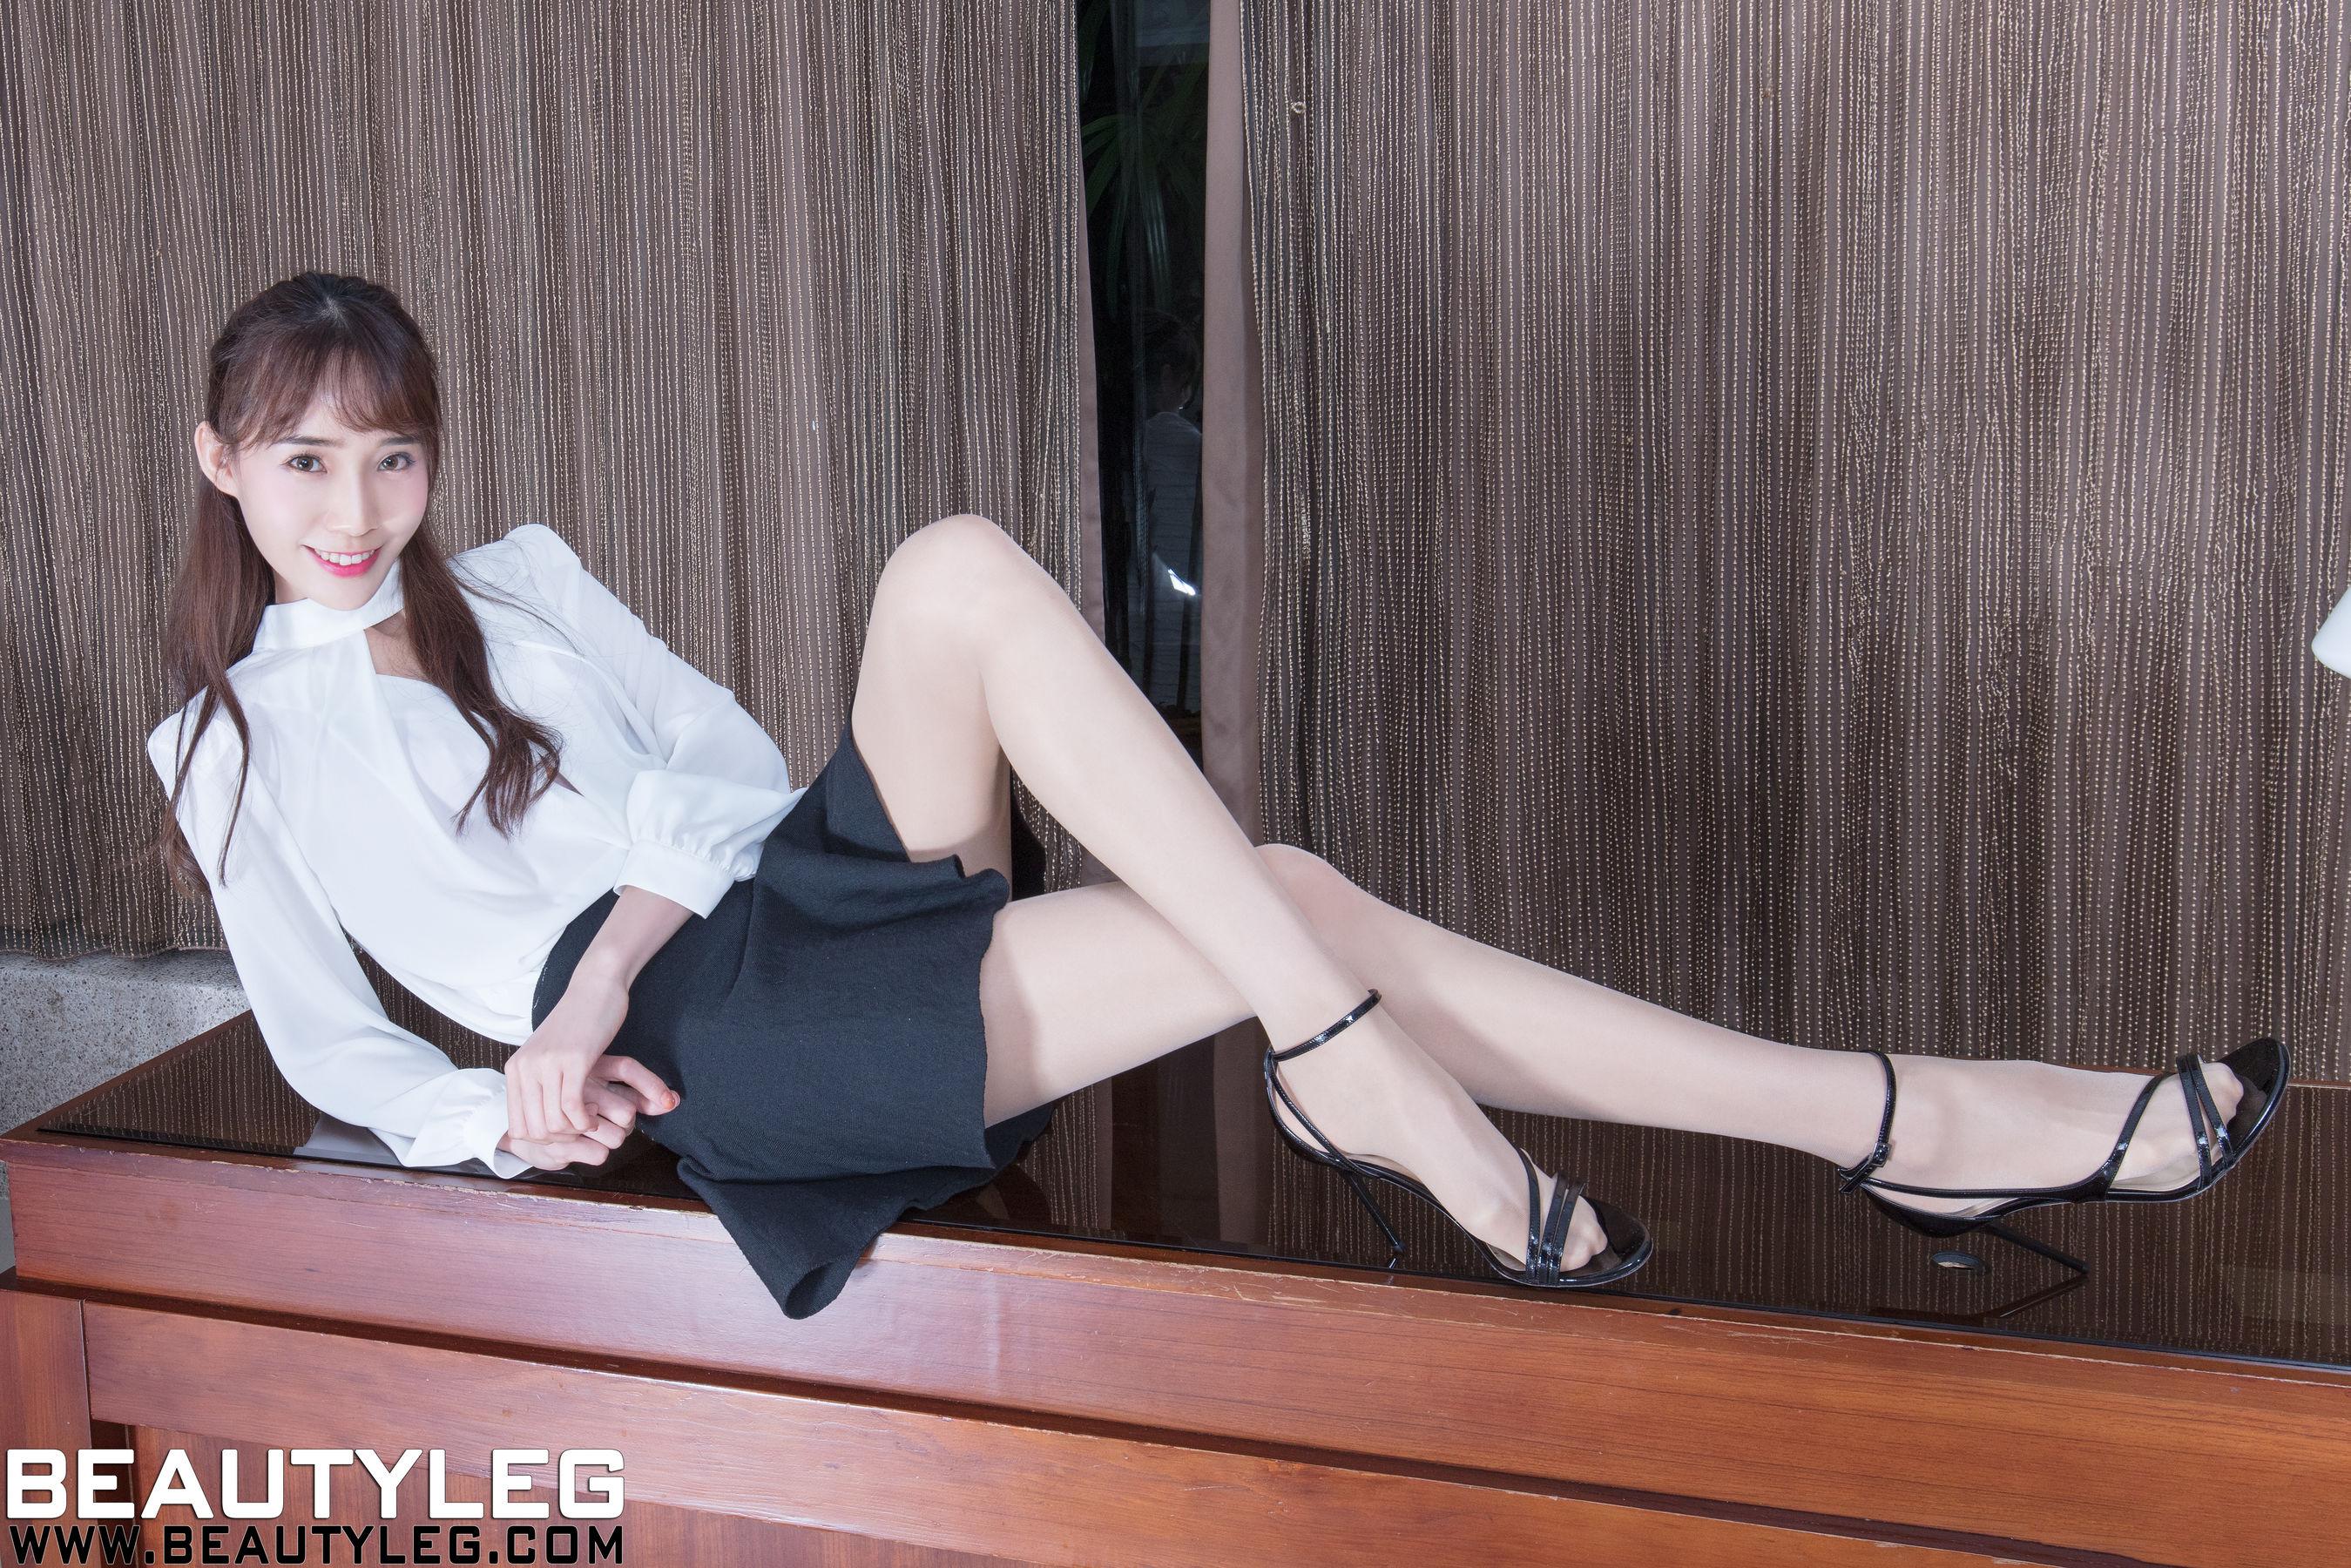 VOL.1181 [Beautyleg]制服丝袜美腿长腿美女丝袜制服:腿模Bobi(Beautyleg Bobi)超高清个人性感漂亮大图(60P)